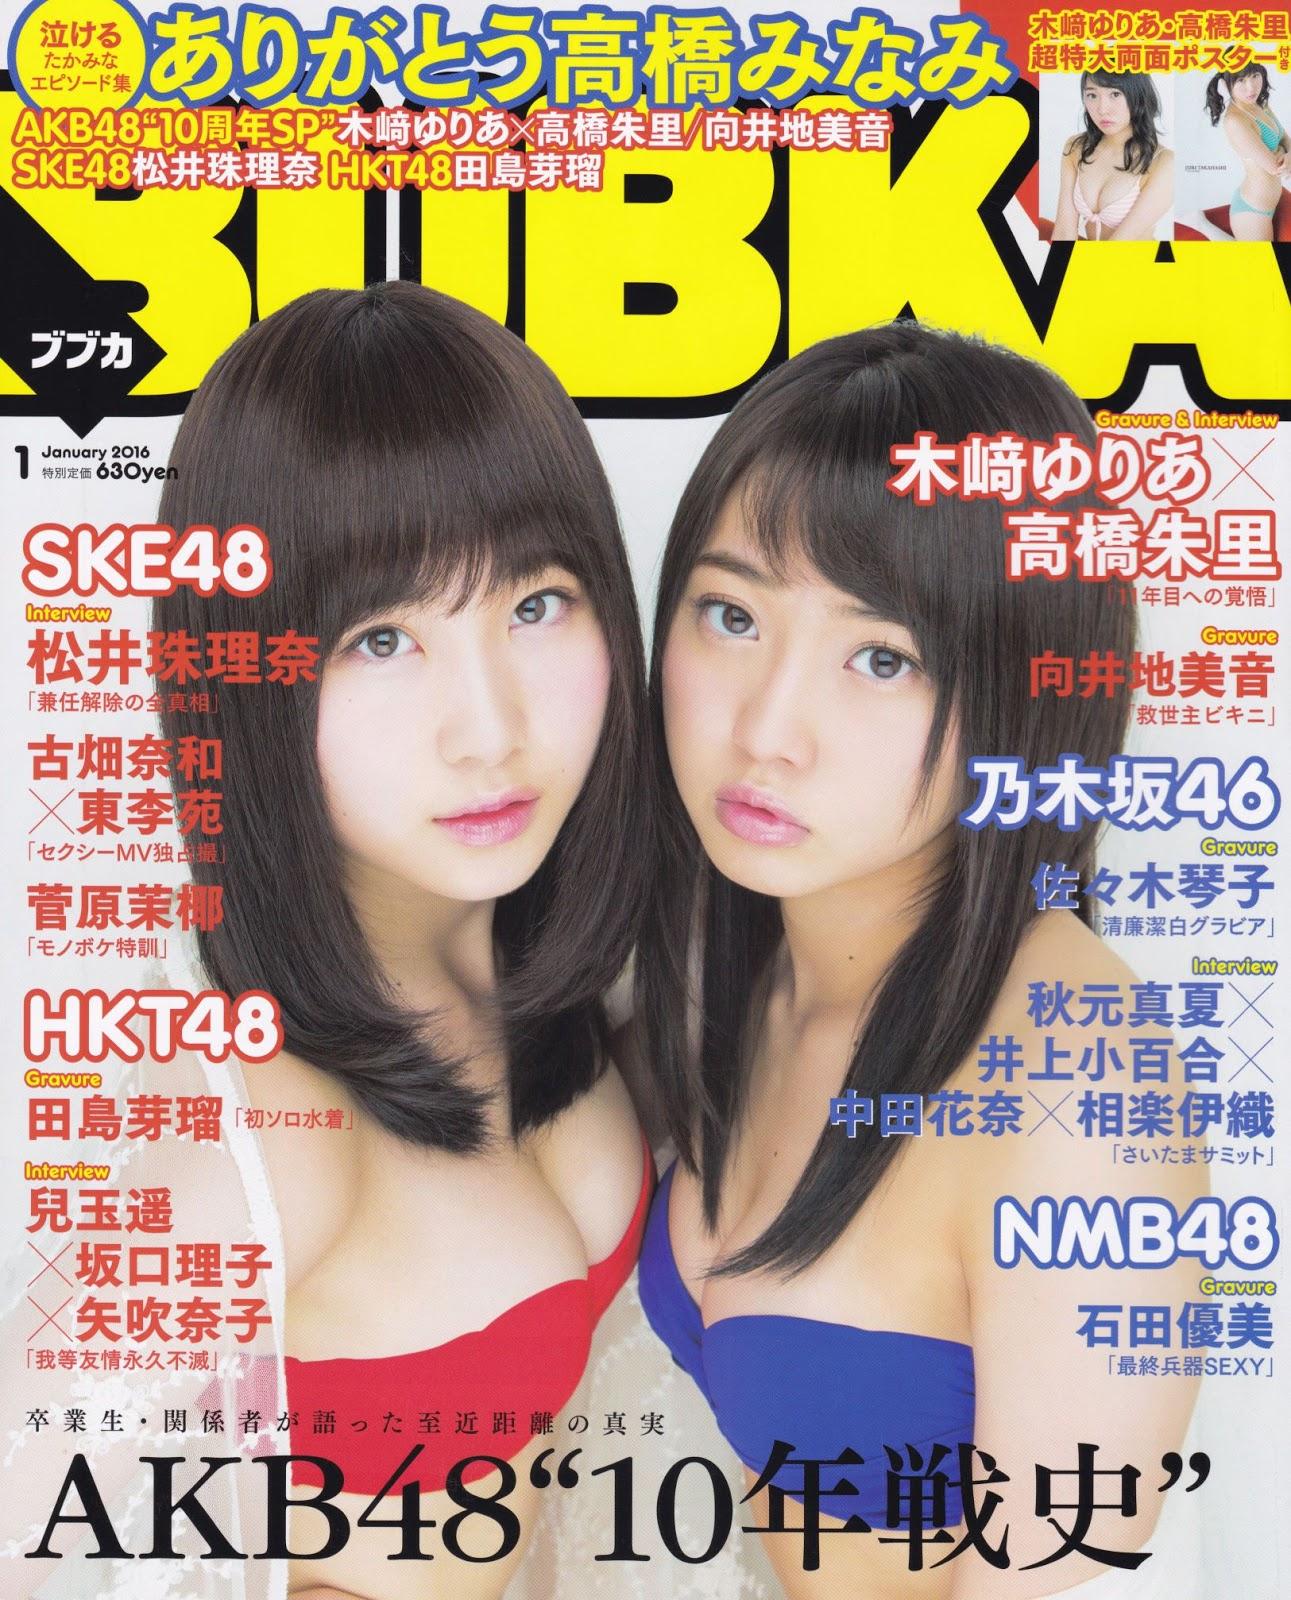 Takahashi Juri 高橋朱里, Kizaki Yuria 木﨑ゆりあ AKB48, BUBKA 2016.01 (ブブカ 2016年01月号)